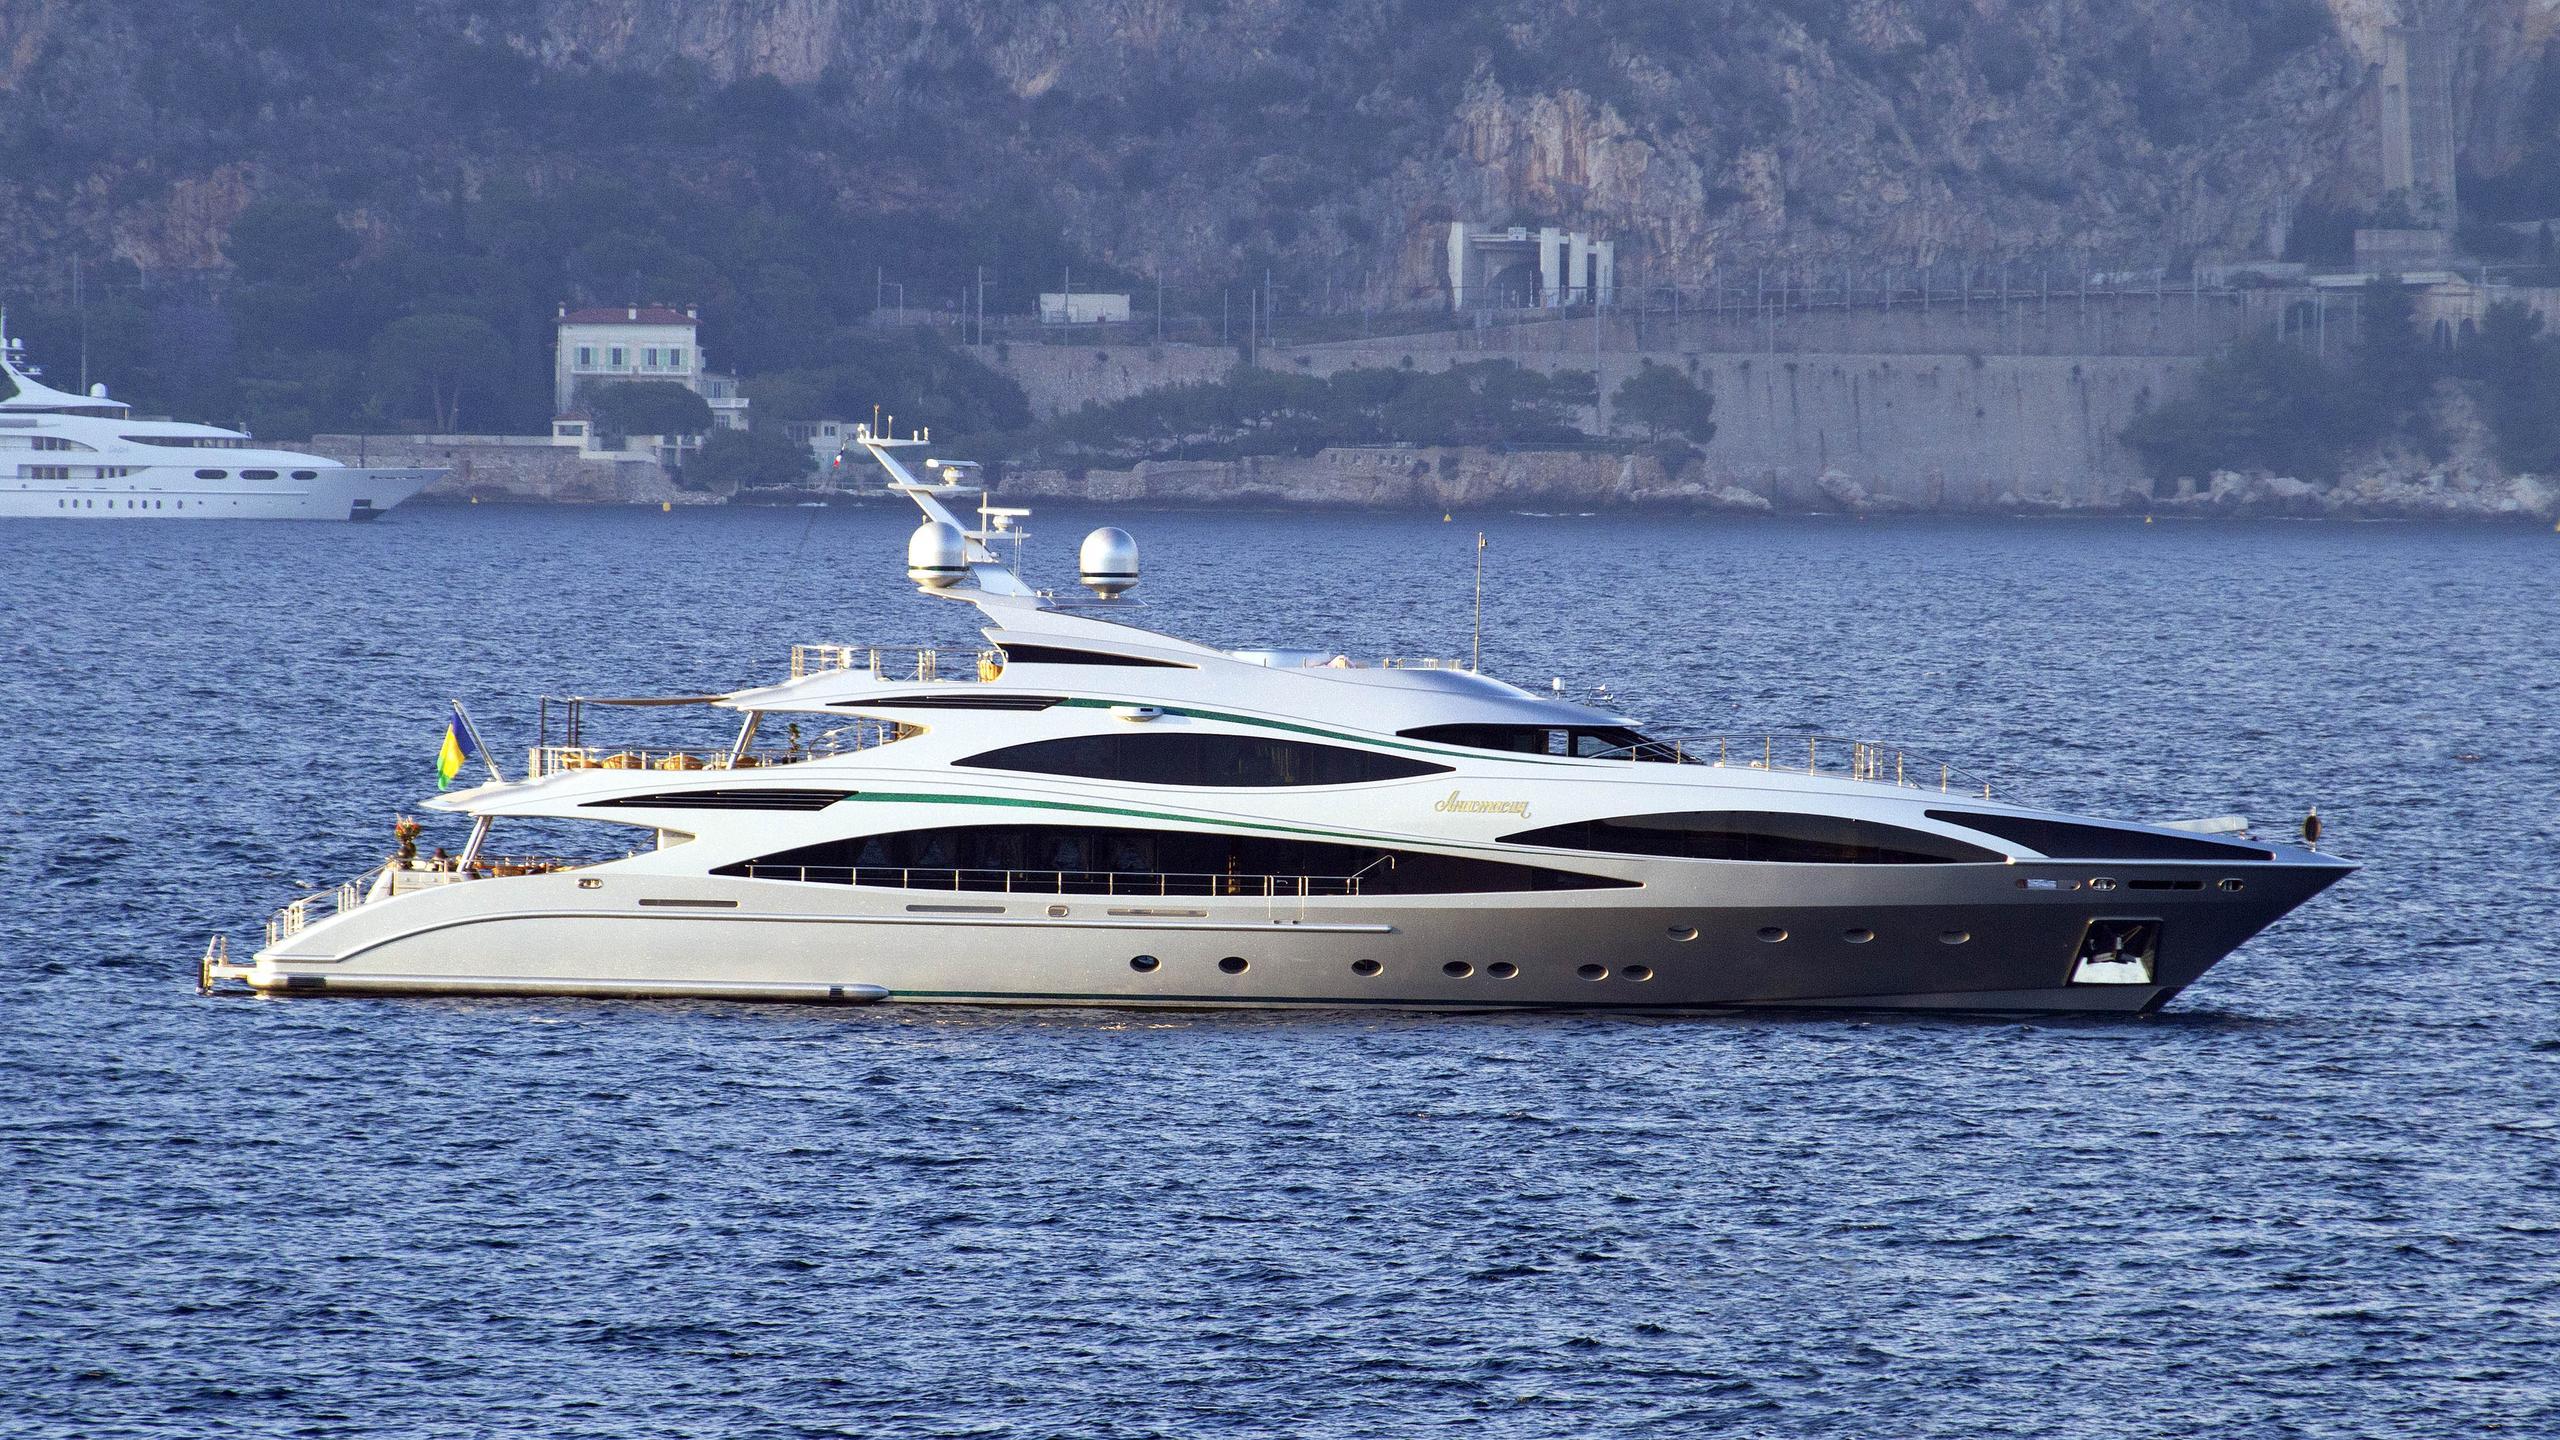 anastasia-k-motor-yacht-benetti-2014-47m-profile